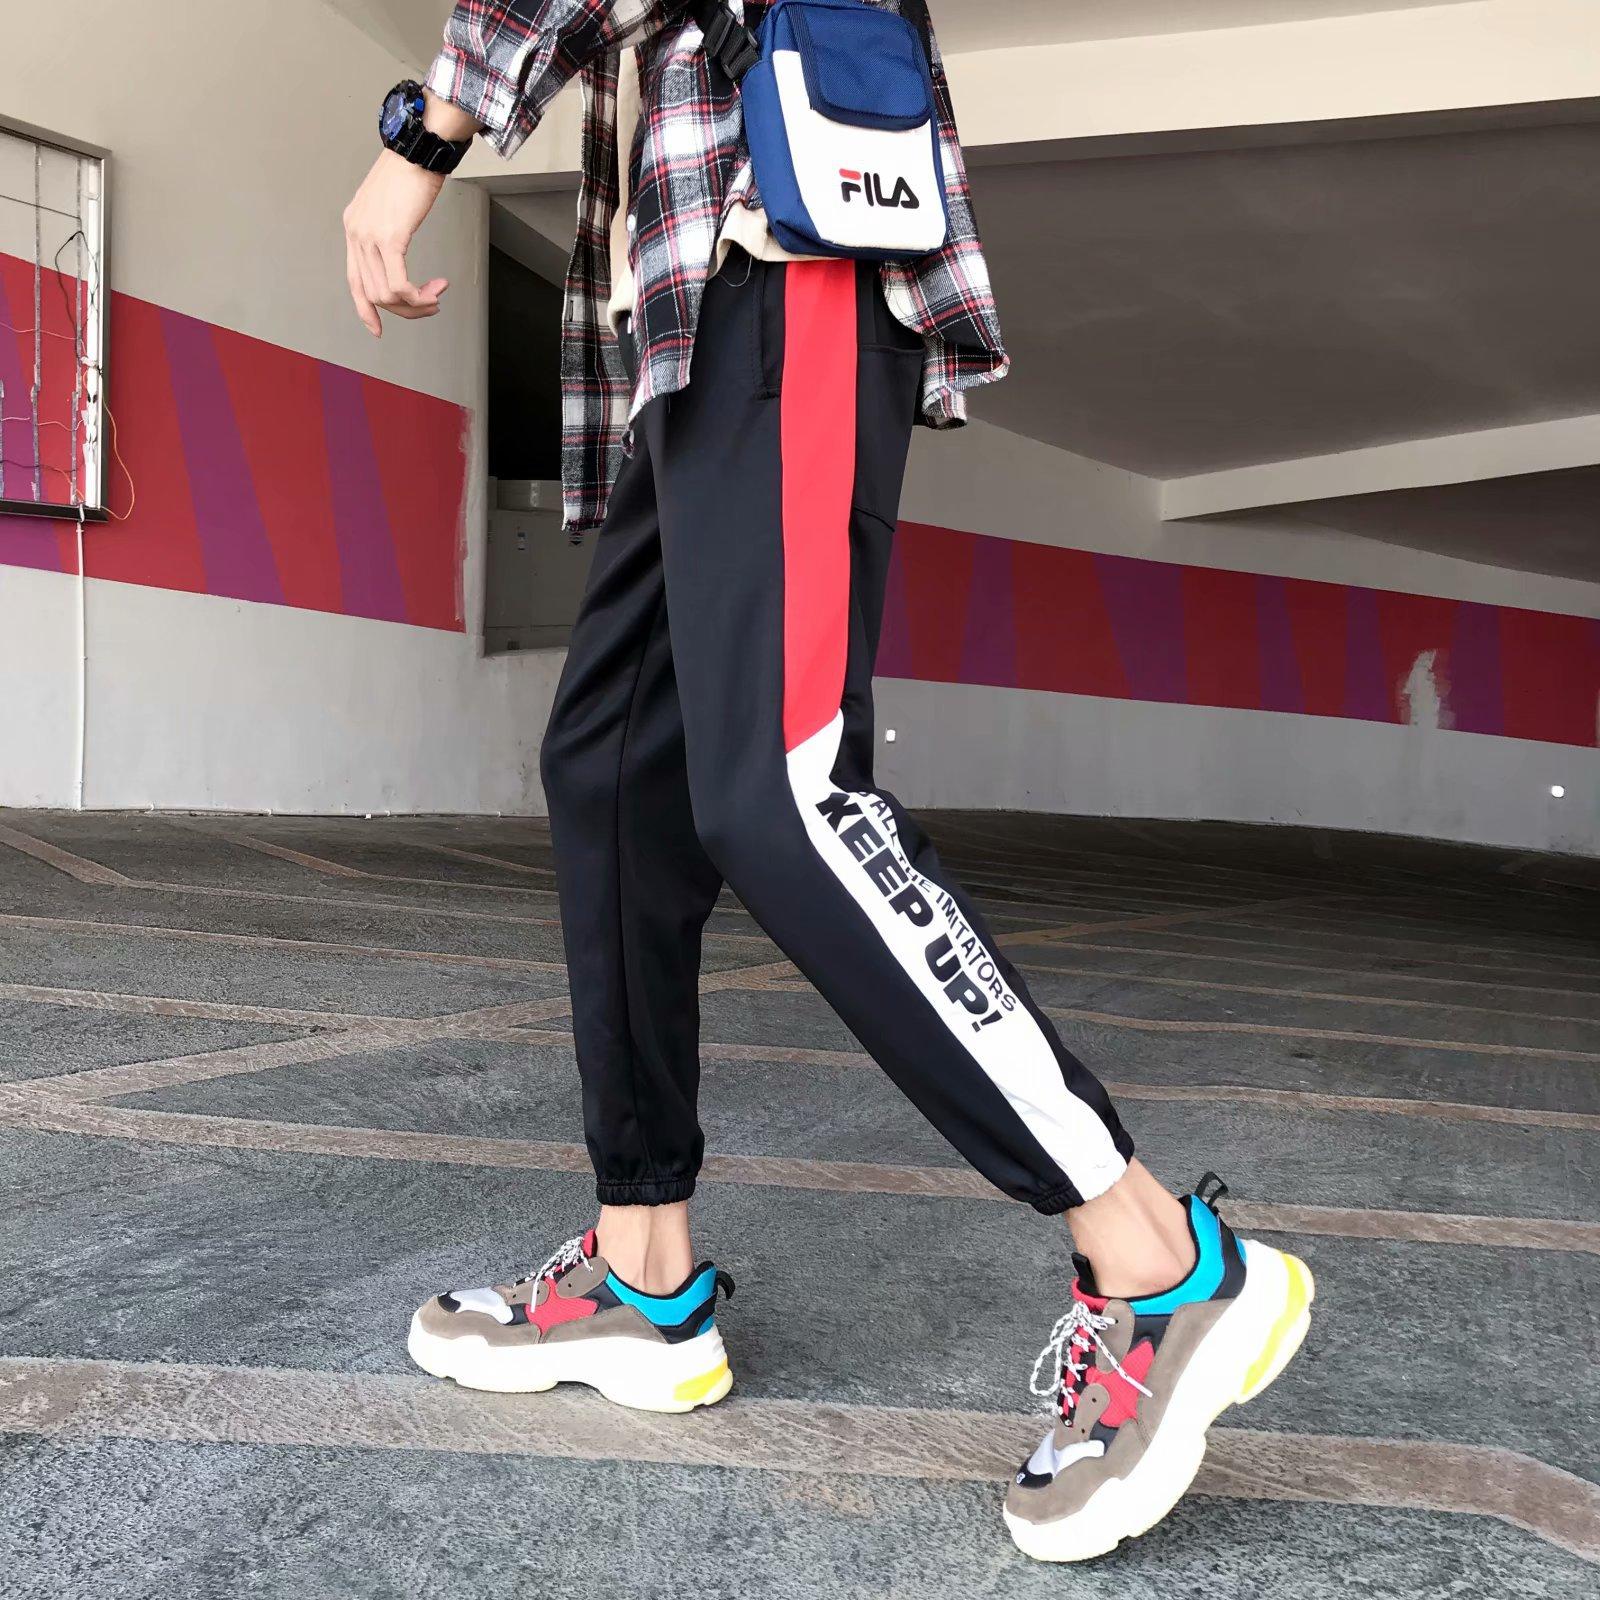 Summer Trousers Men's Thin Students Capri Pants Slim Fit Large Size Japanese-style Mixed Colors Beam Leg Athletic Pants Korean-s